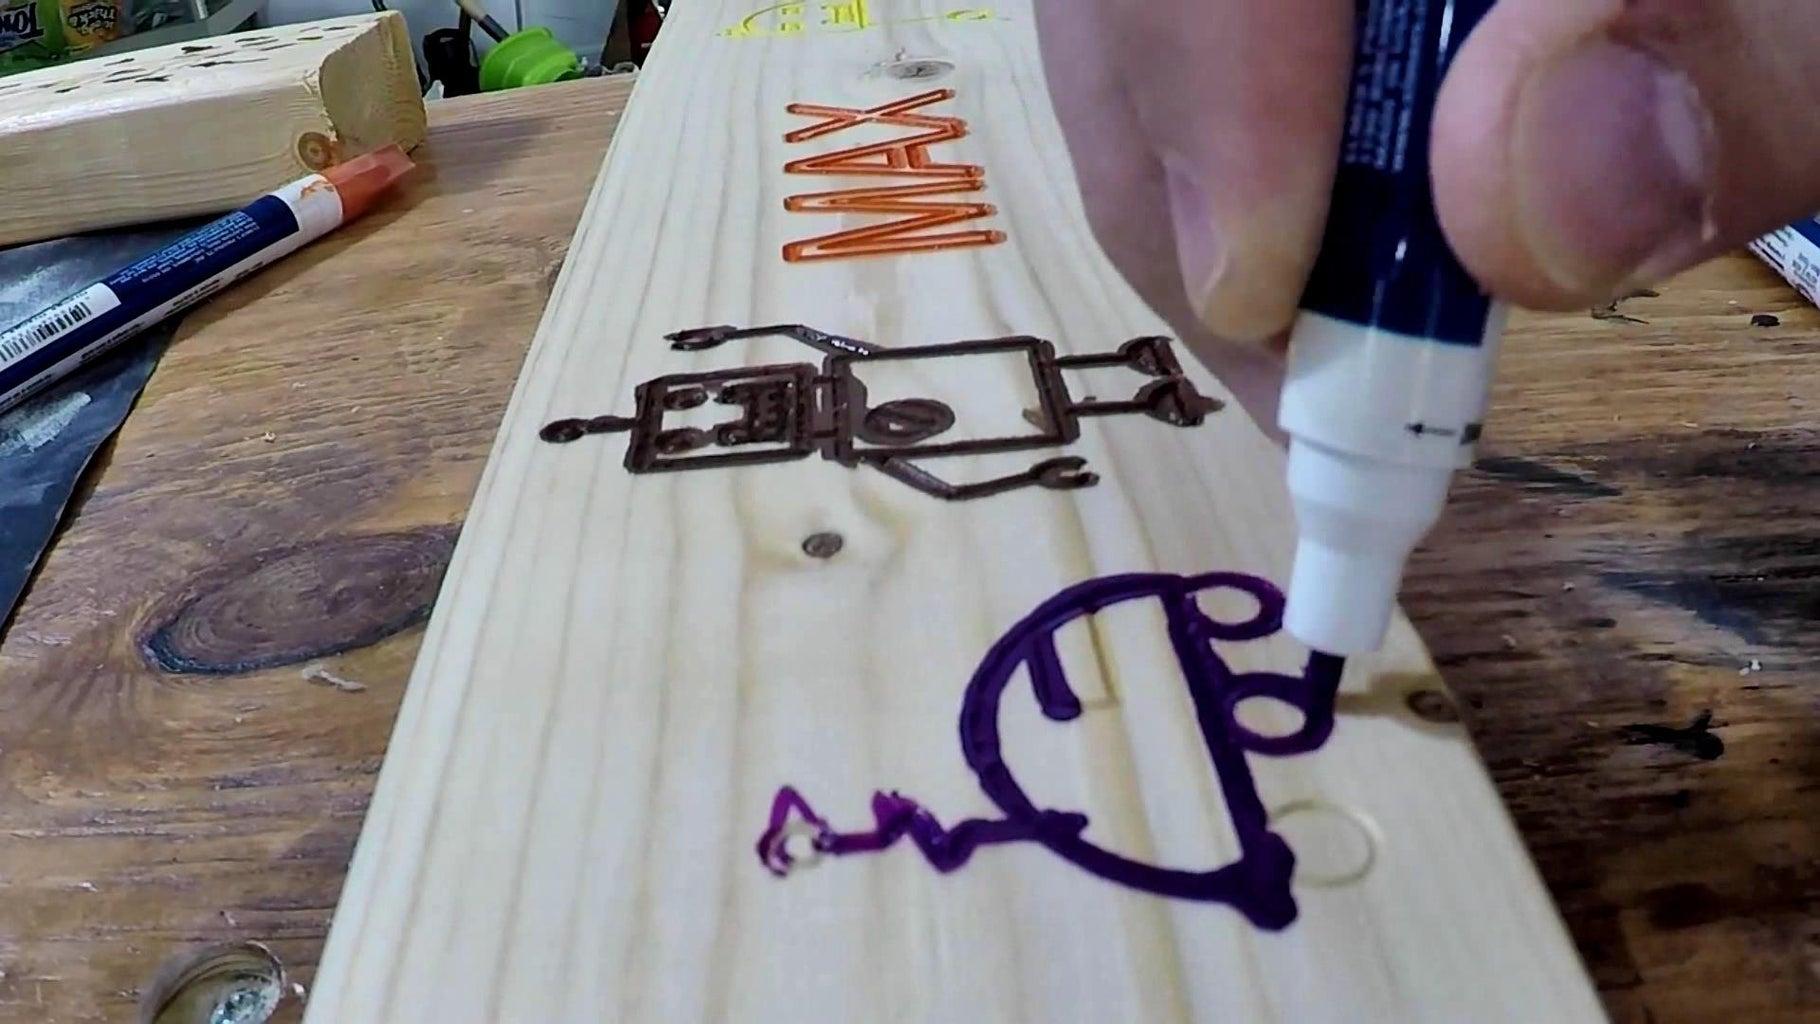 (Optional) Finish Headboard Engraving